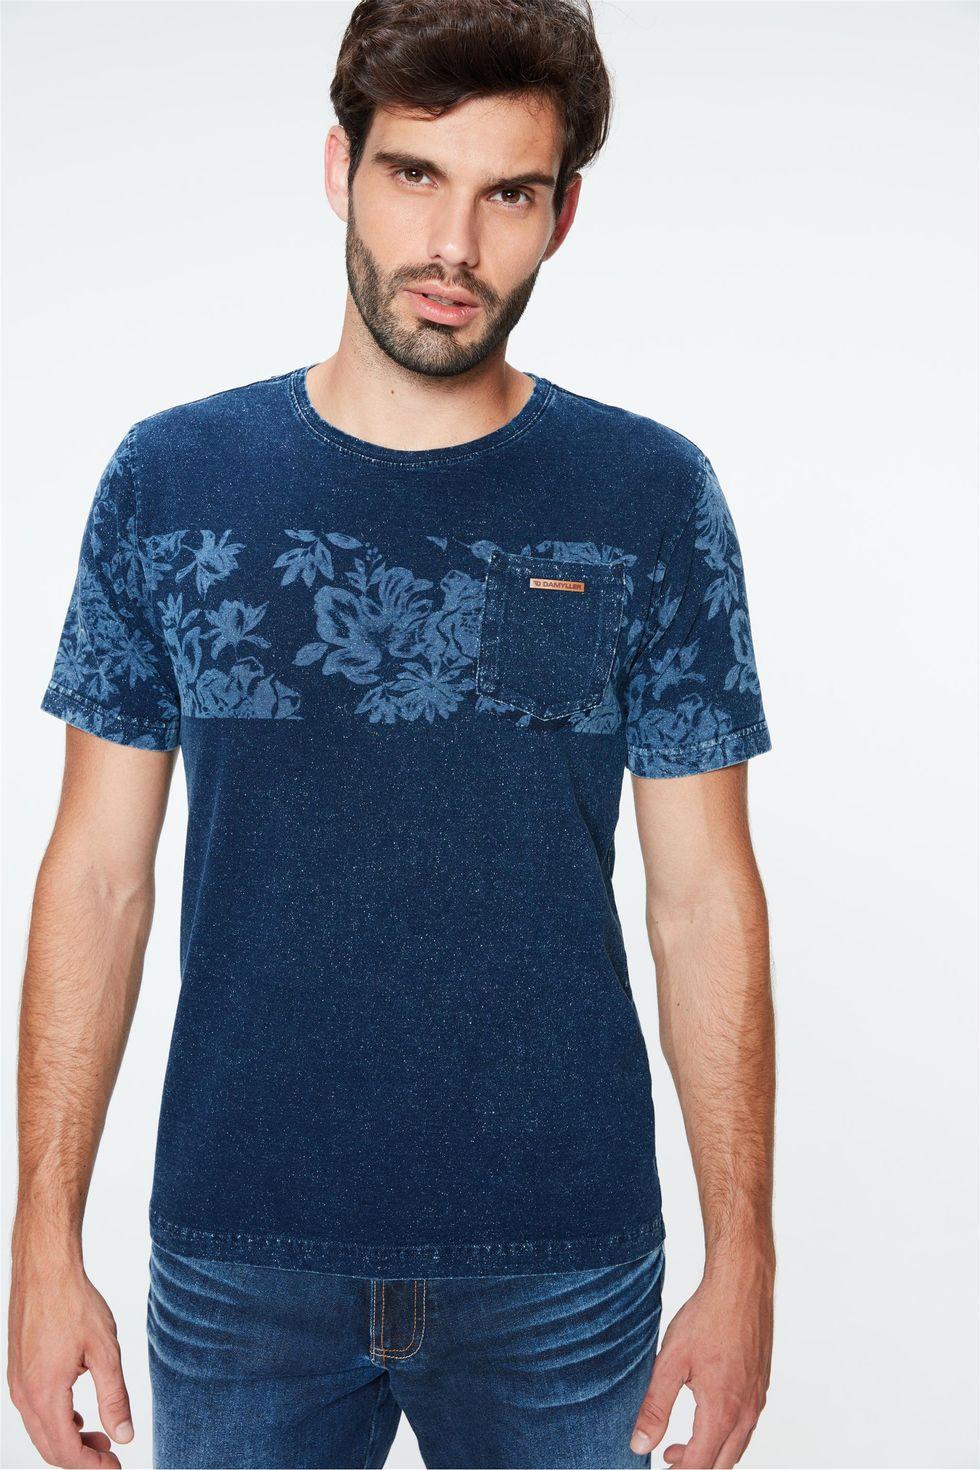 Camiseta-de-Malha-Denim-com-Estampa-Frente--